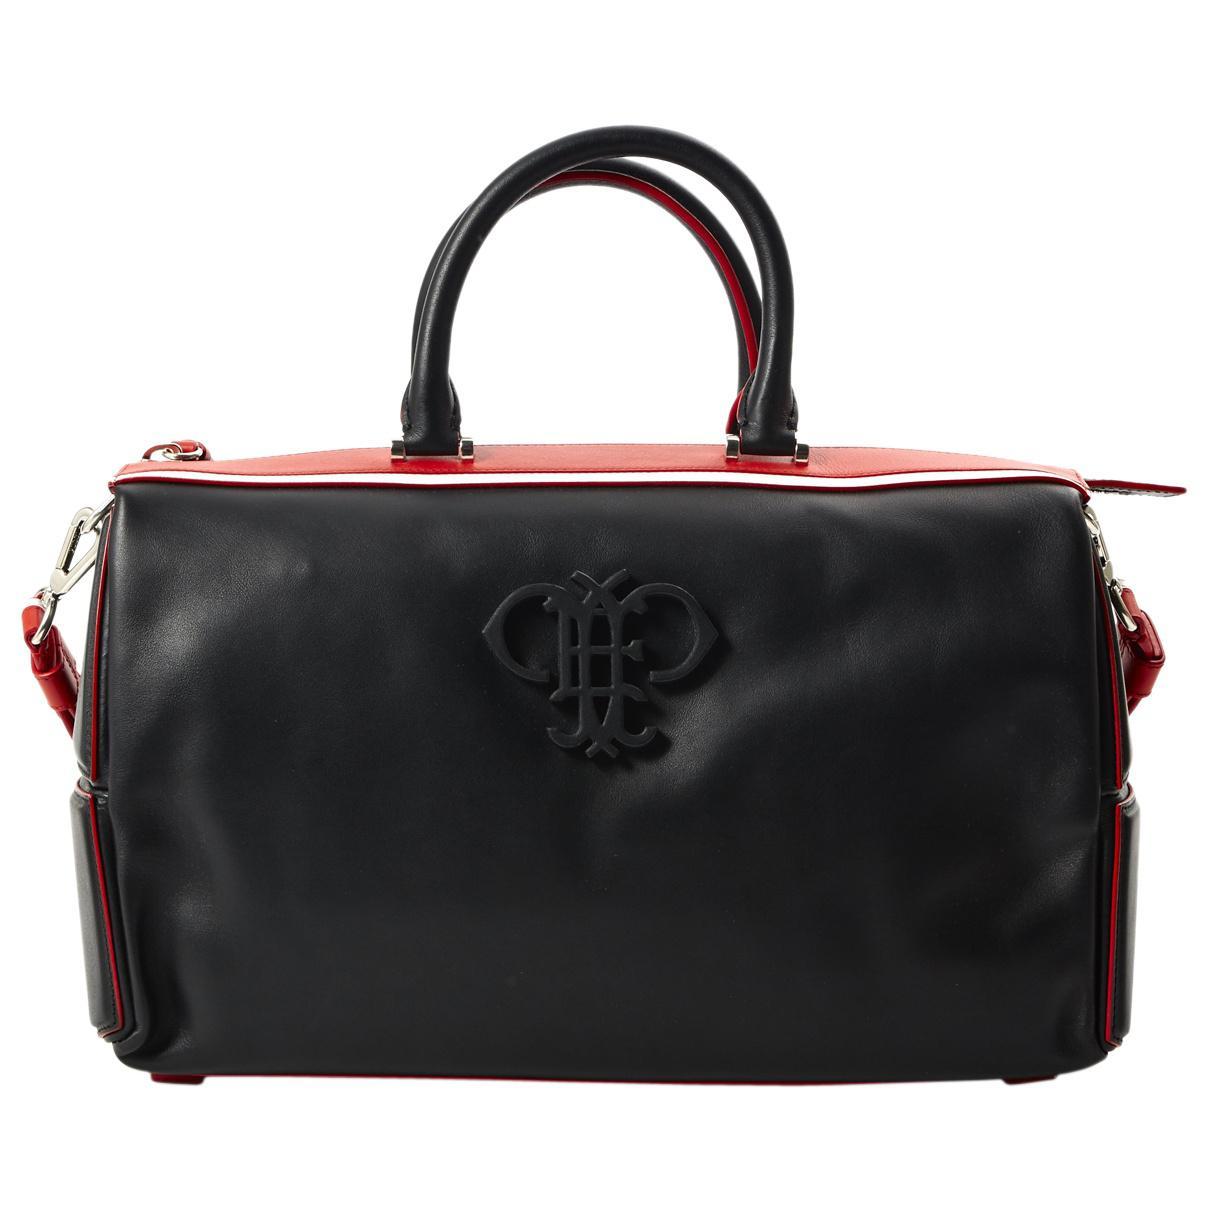 Emilio Pucci Pre-owned - Handbag tV7bpg